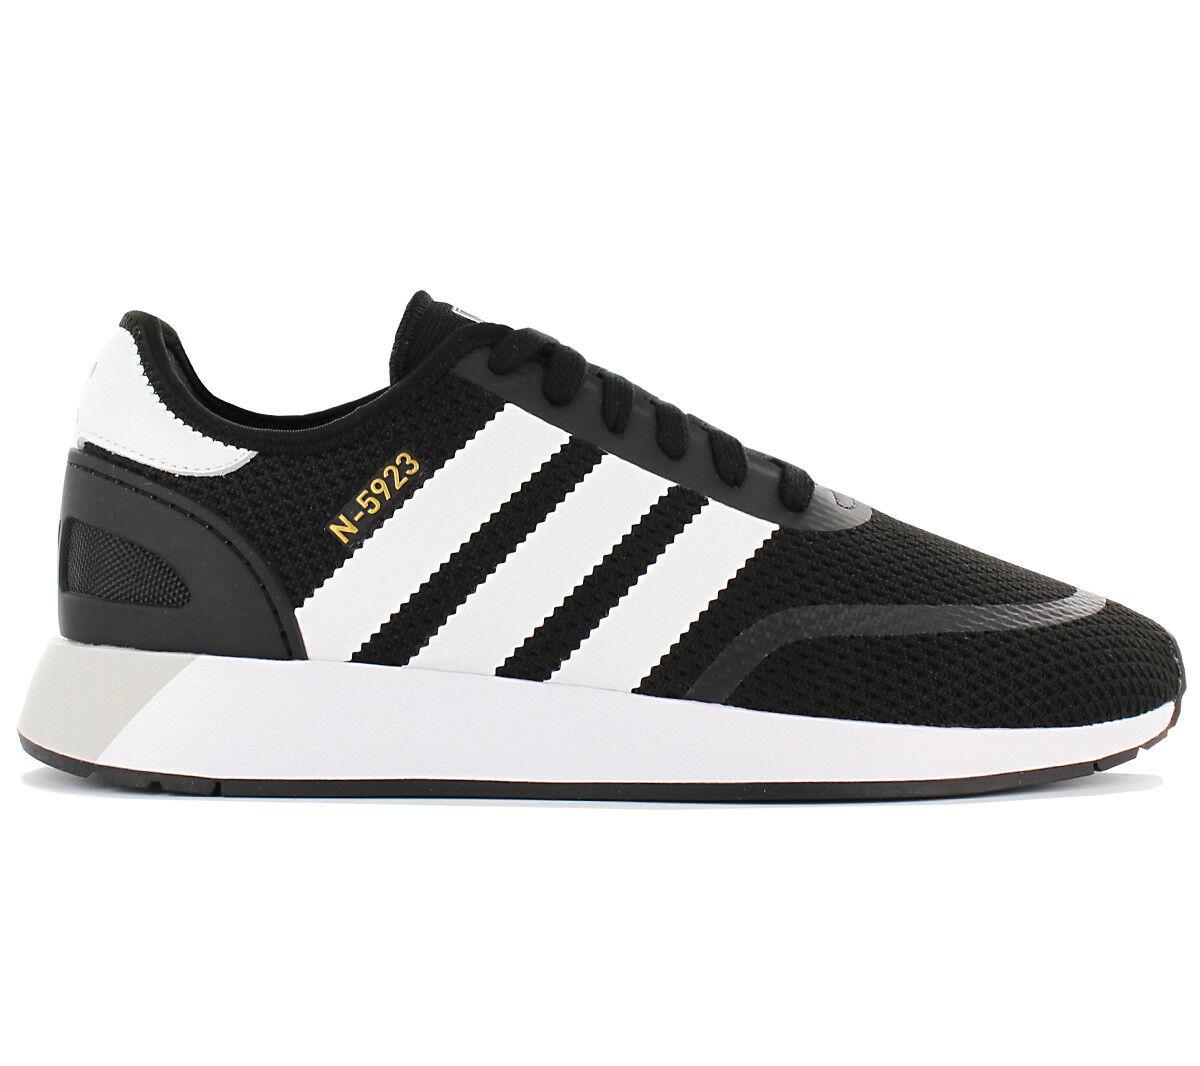 Adidas Originals Iniki N -523 scarpe da ginnastica  Fashion scarpe scarpe da ginnastica nero CQ2337  godendo i tuoi acquisti